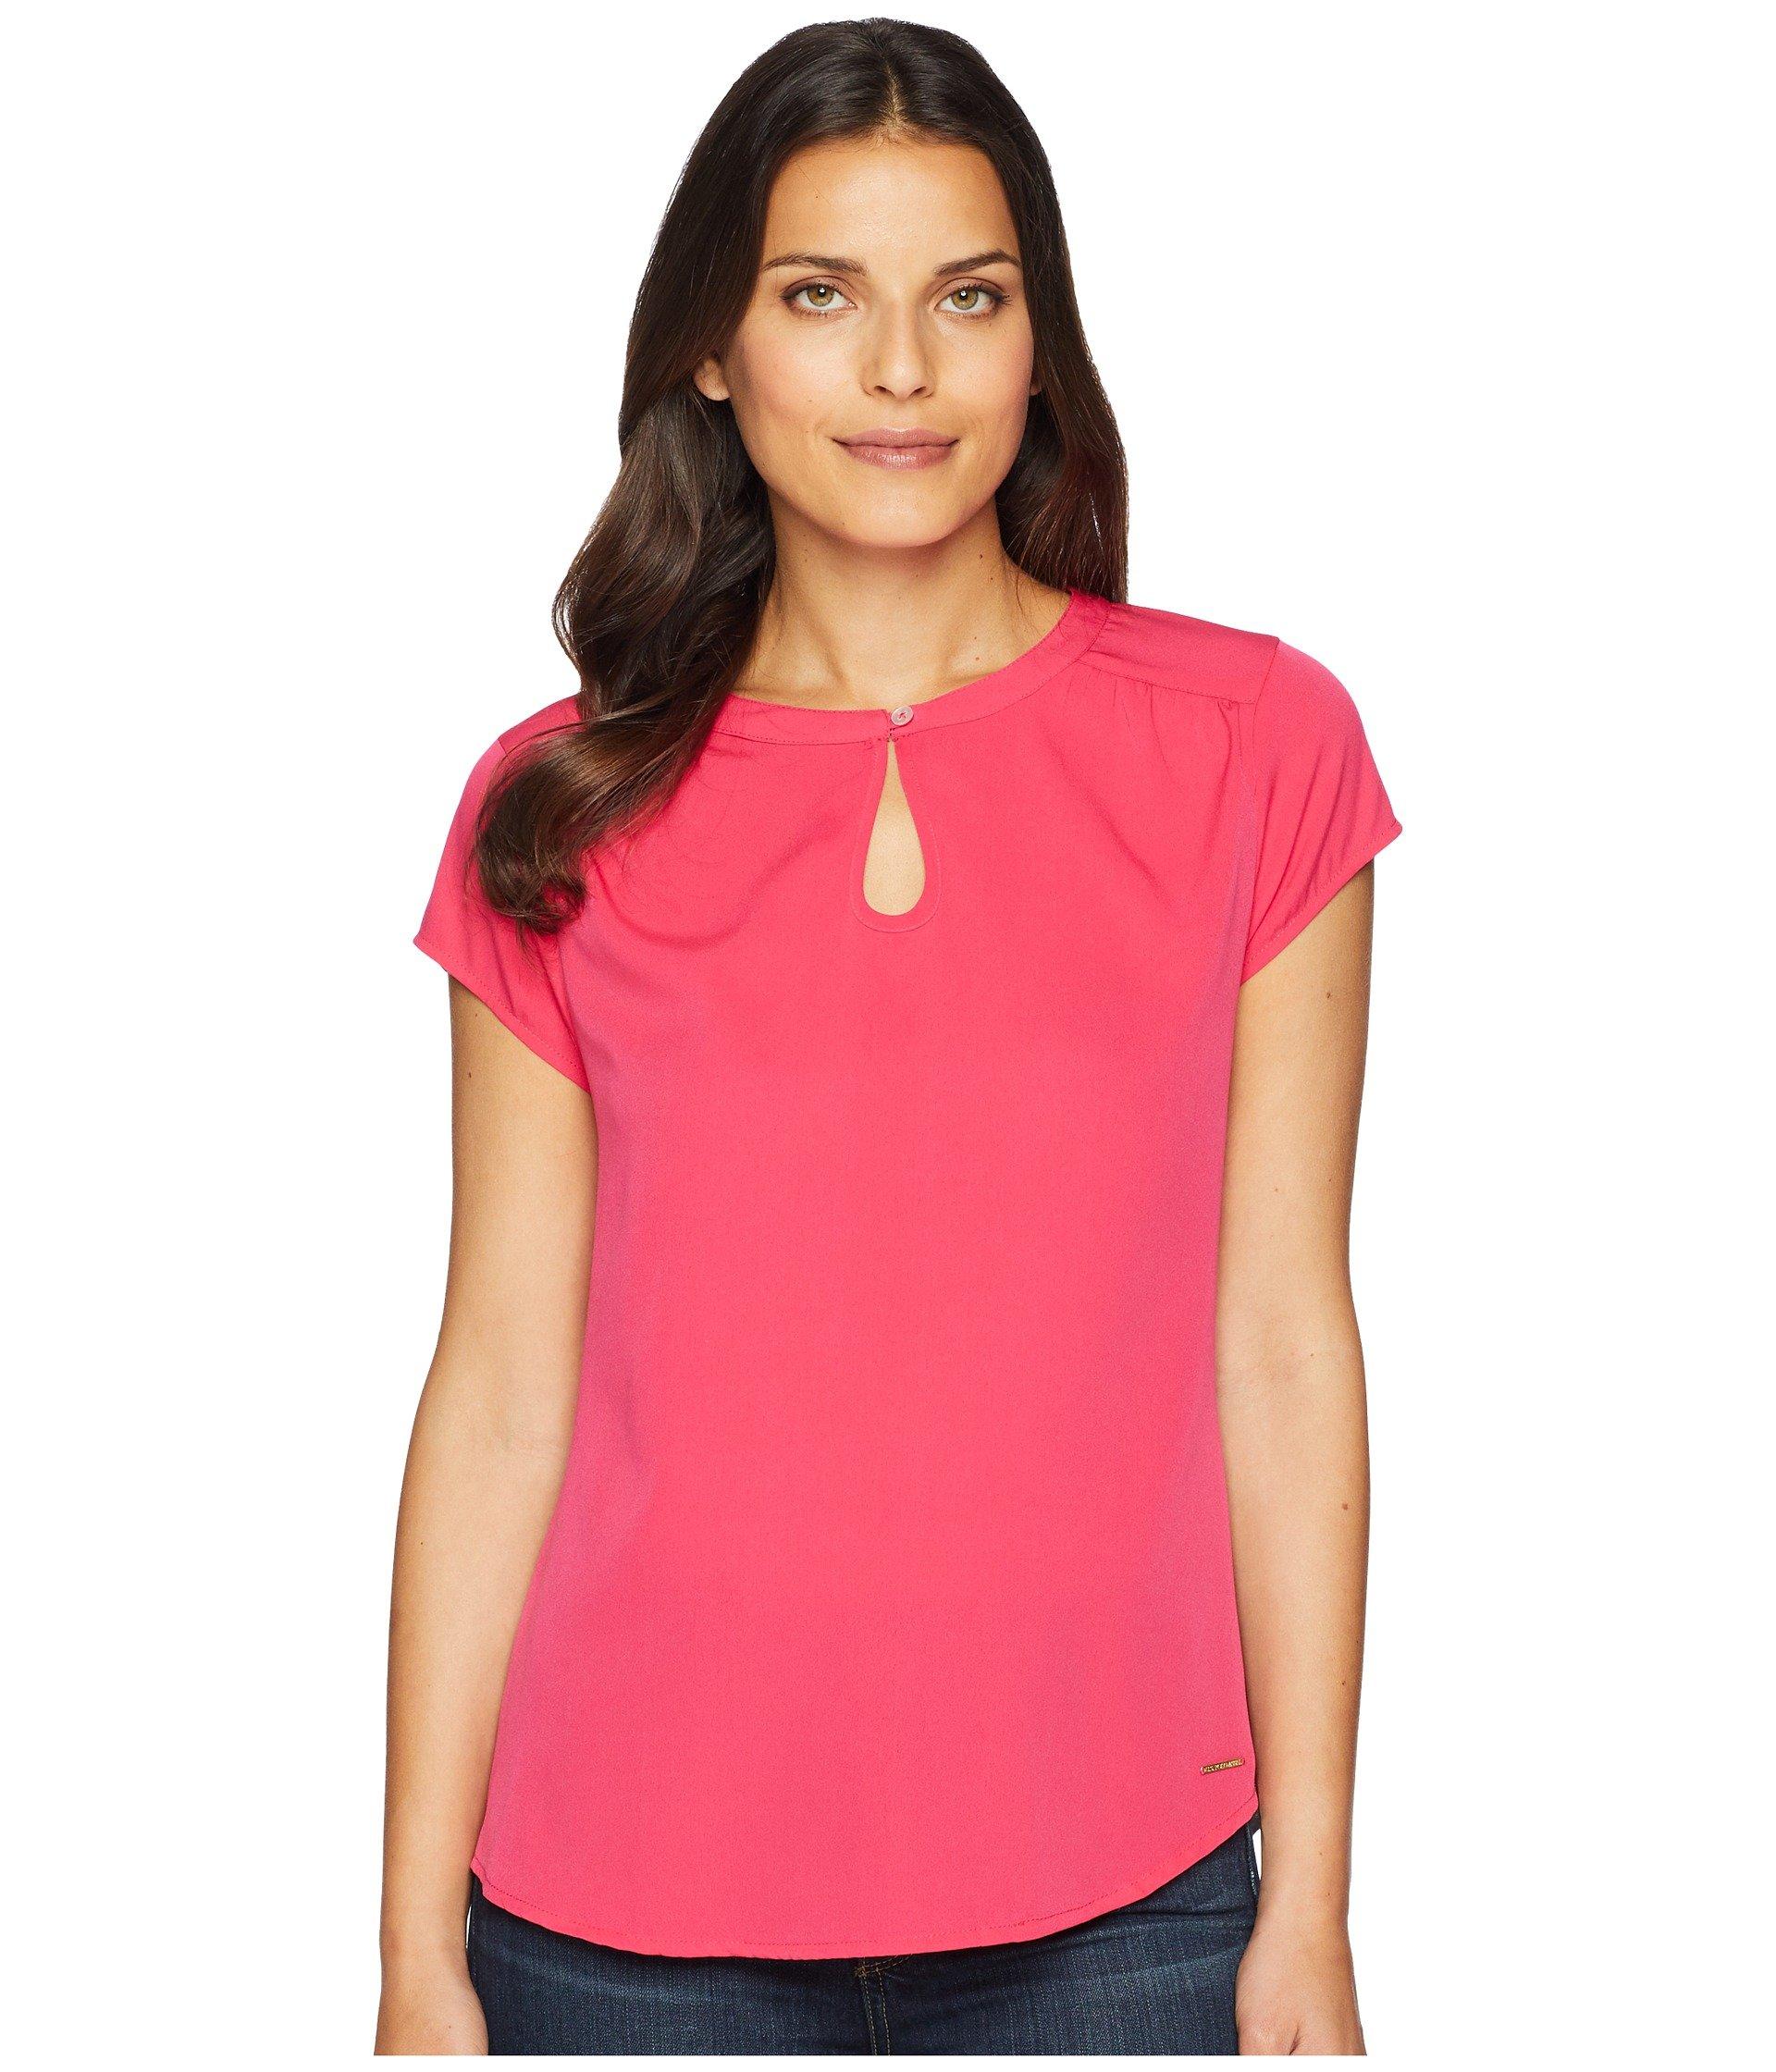 Blusa para Mujer U.S. POLO ASSN. Keyhole Knit Woven Shirt  + U.S. POLO ASSN. en VeoyCompro.net